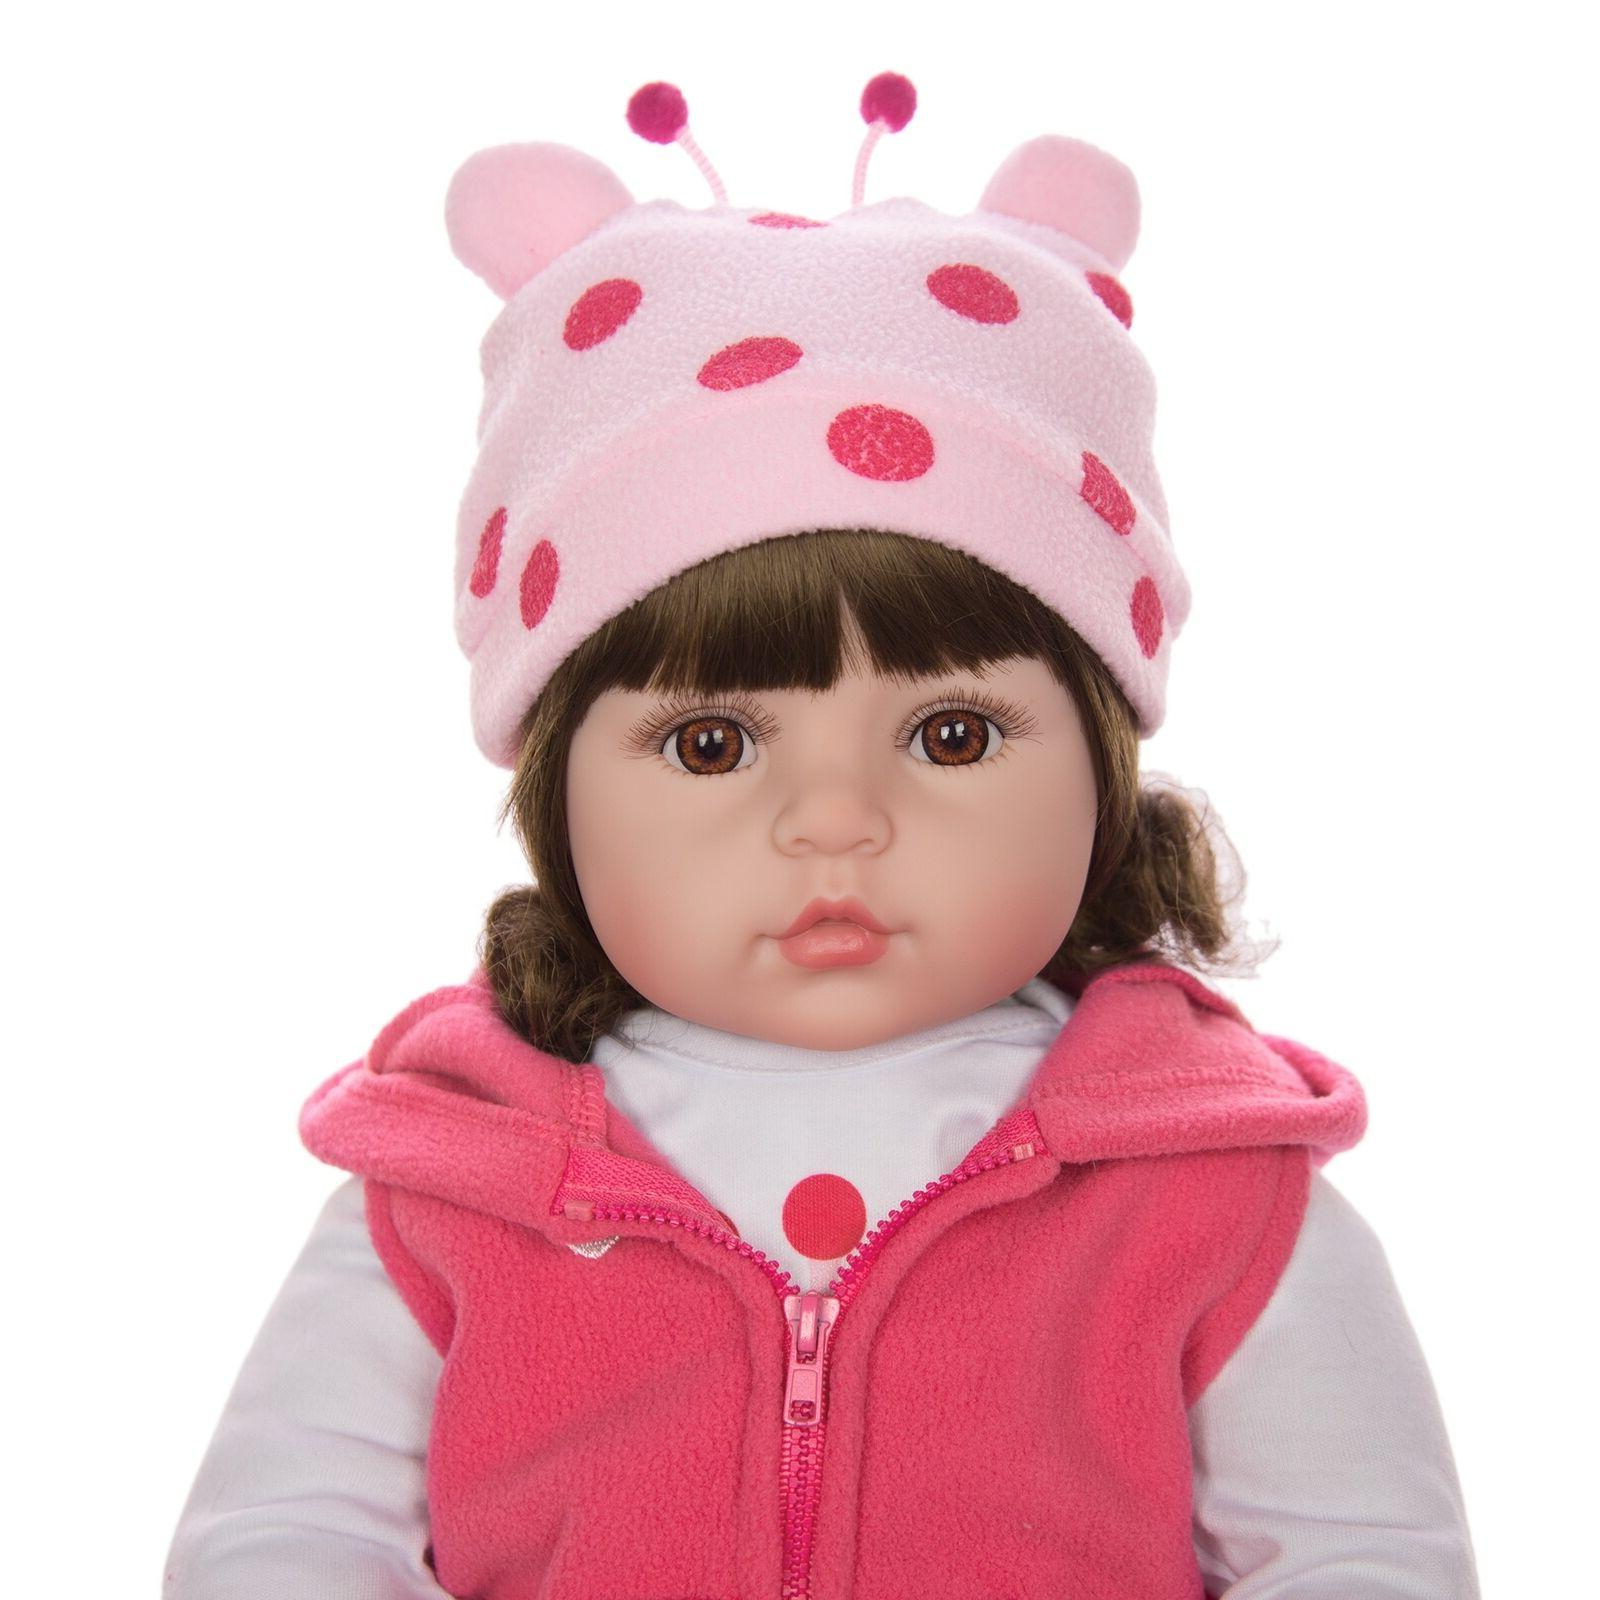 Reborn Cloth Baby Doll Toddler